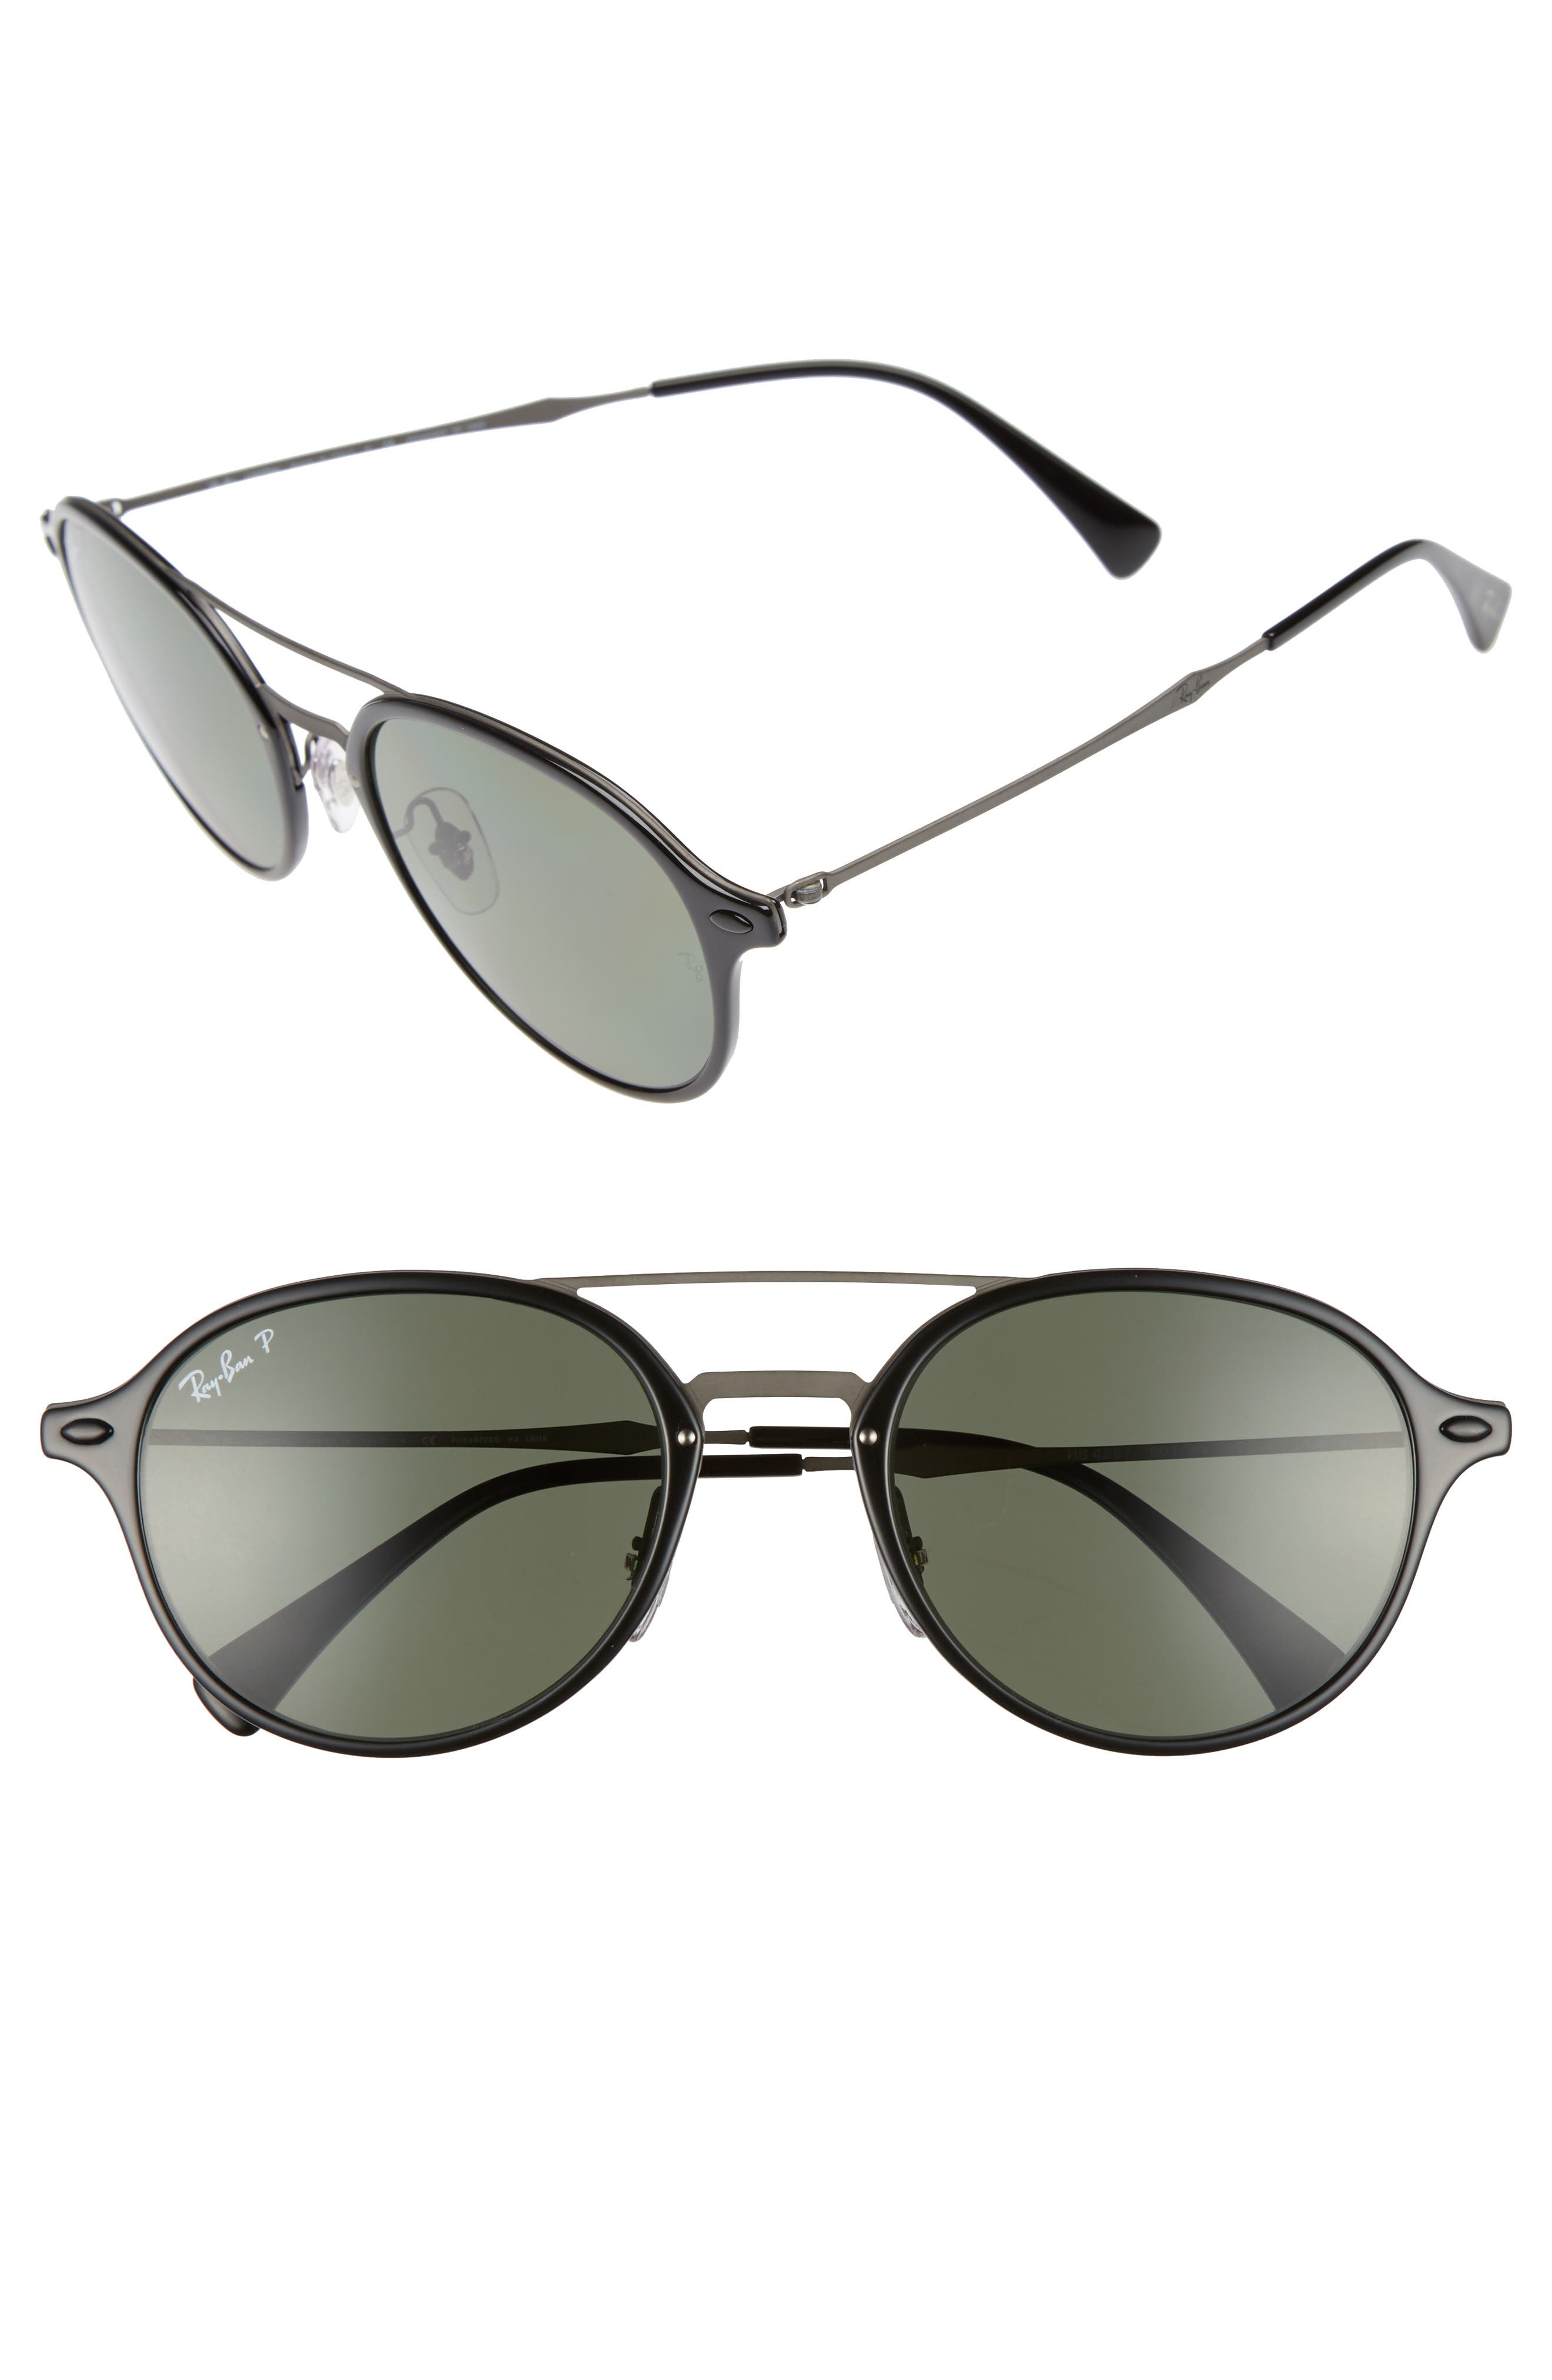 55mm Aviator Sunglasses,                             Main thumbnail 1, color,                             001